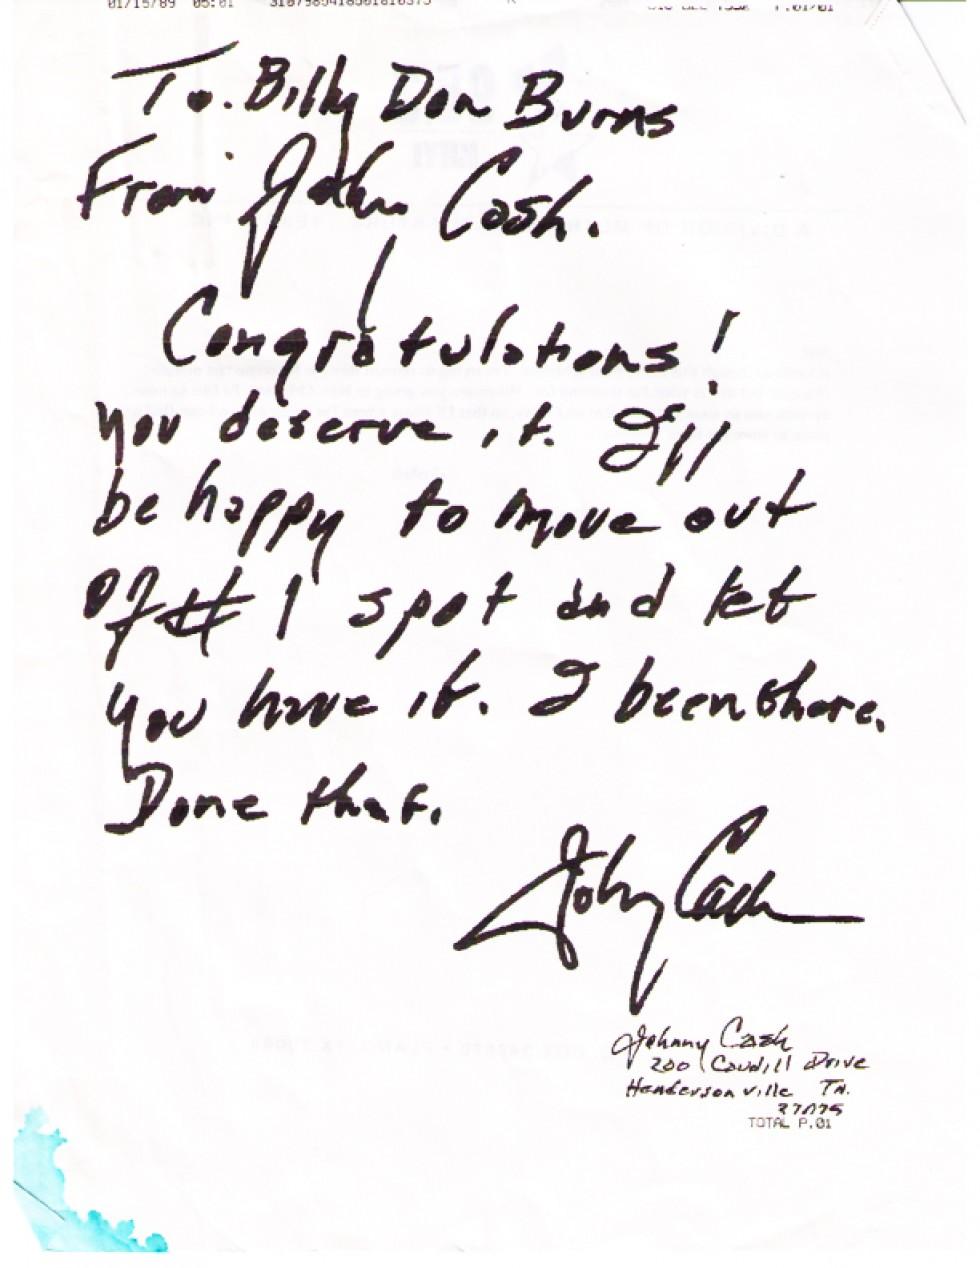 Hank Cochran Memories pt.2 – Fax from John Cash